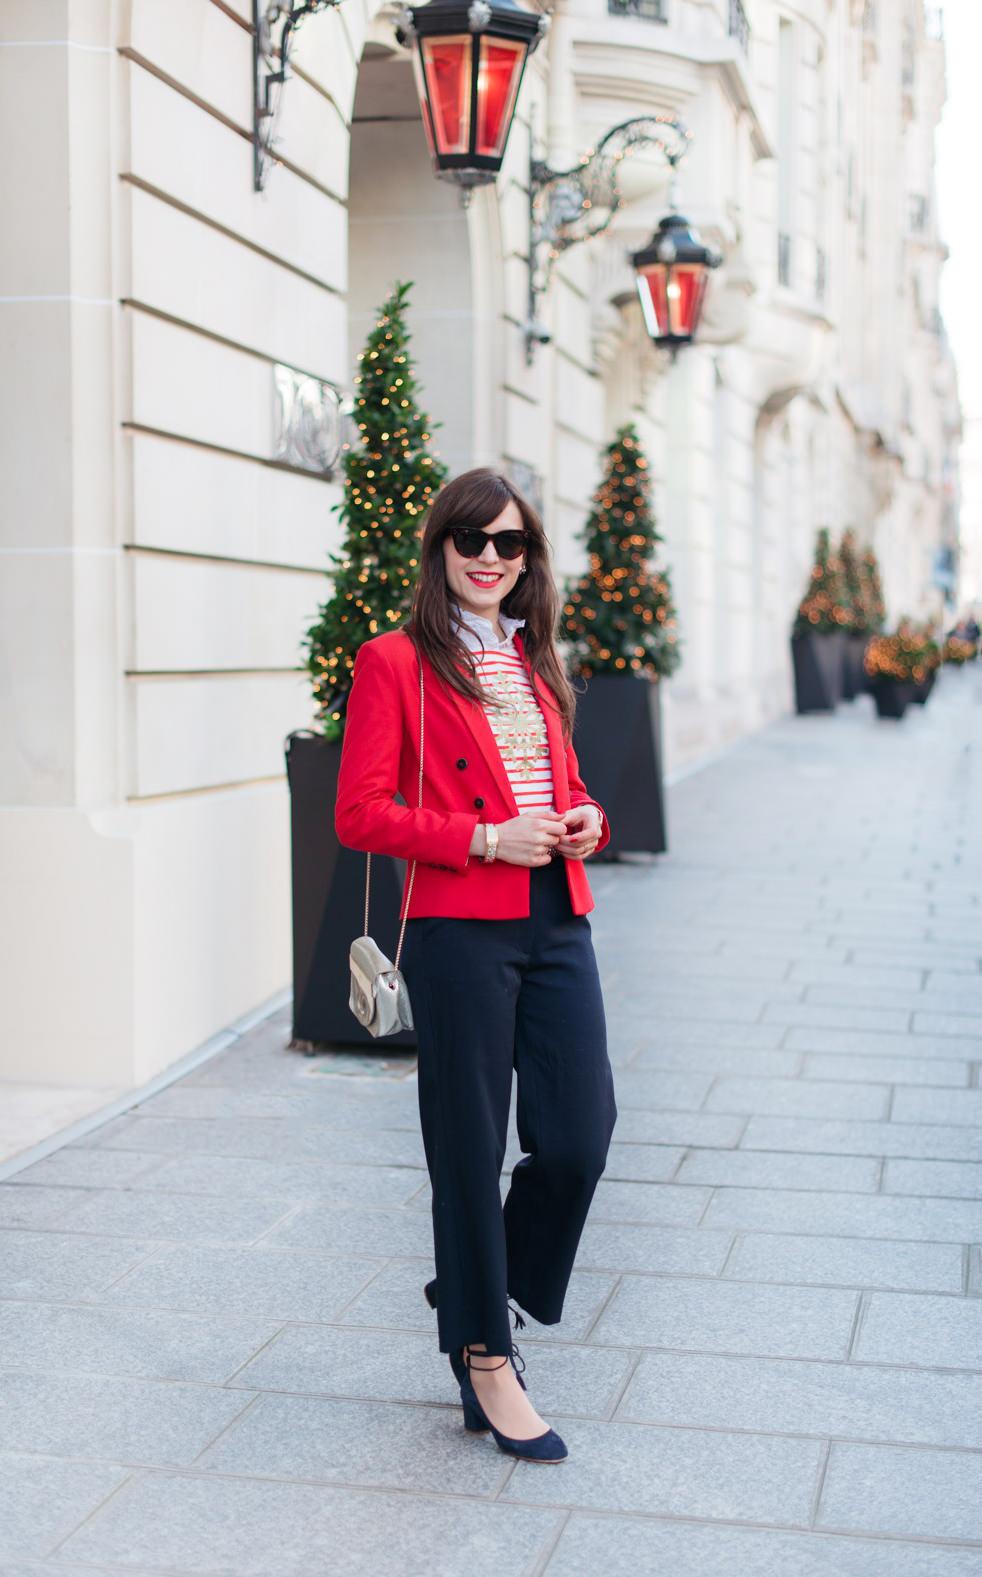 Blog-Mode-And-The-City-Looks-Mariniere-de-Noel-7